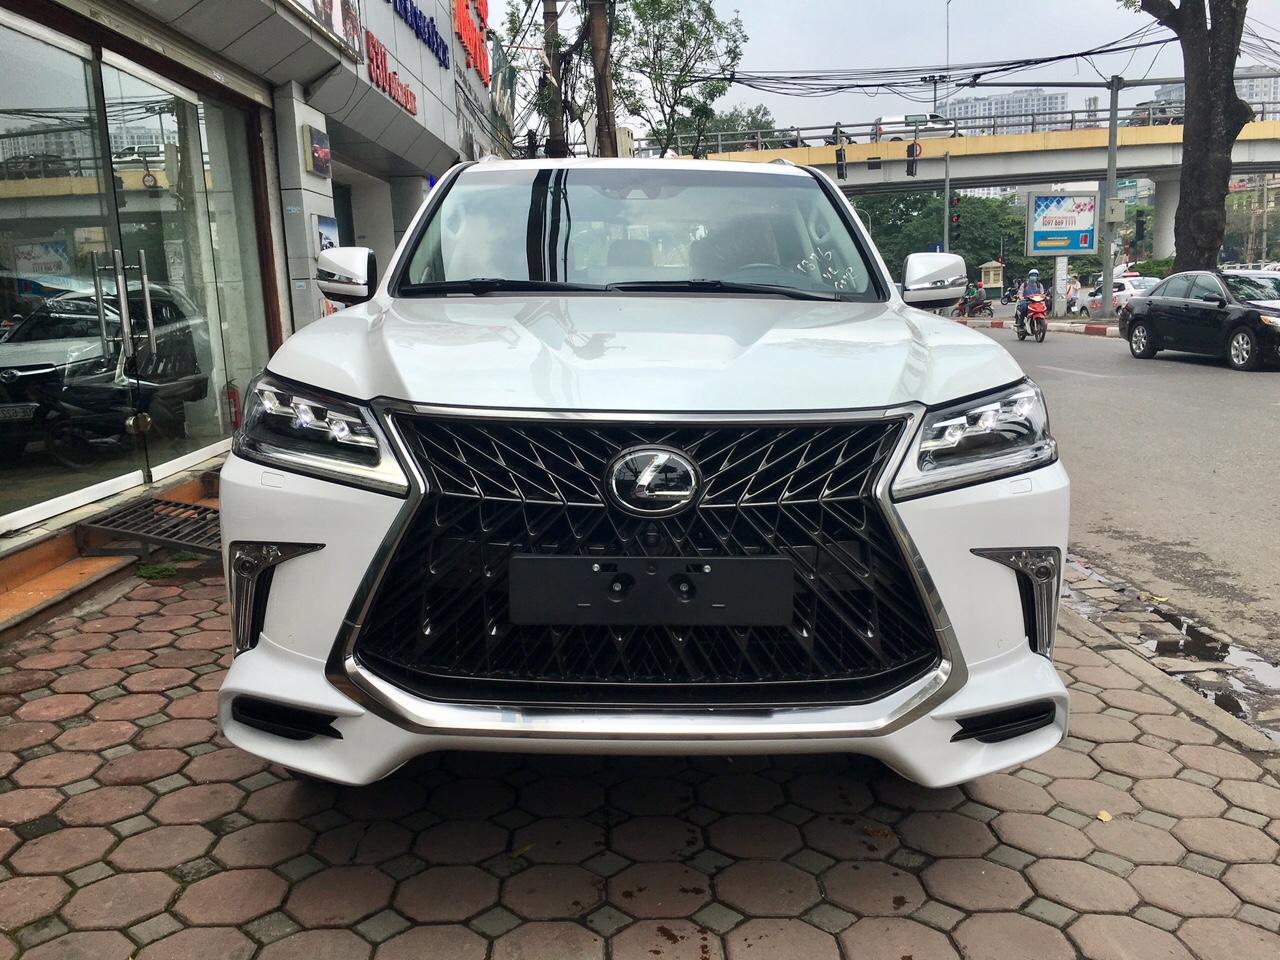 Thiết kế đầu xe Lexus LX570 Super Sport 2019